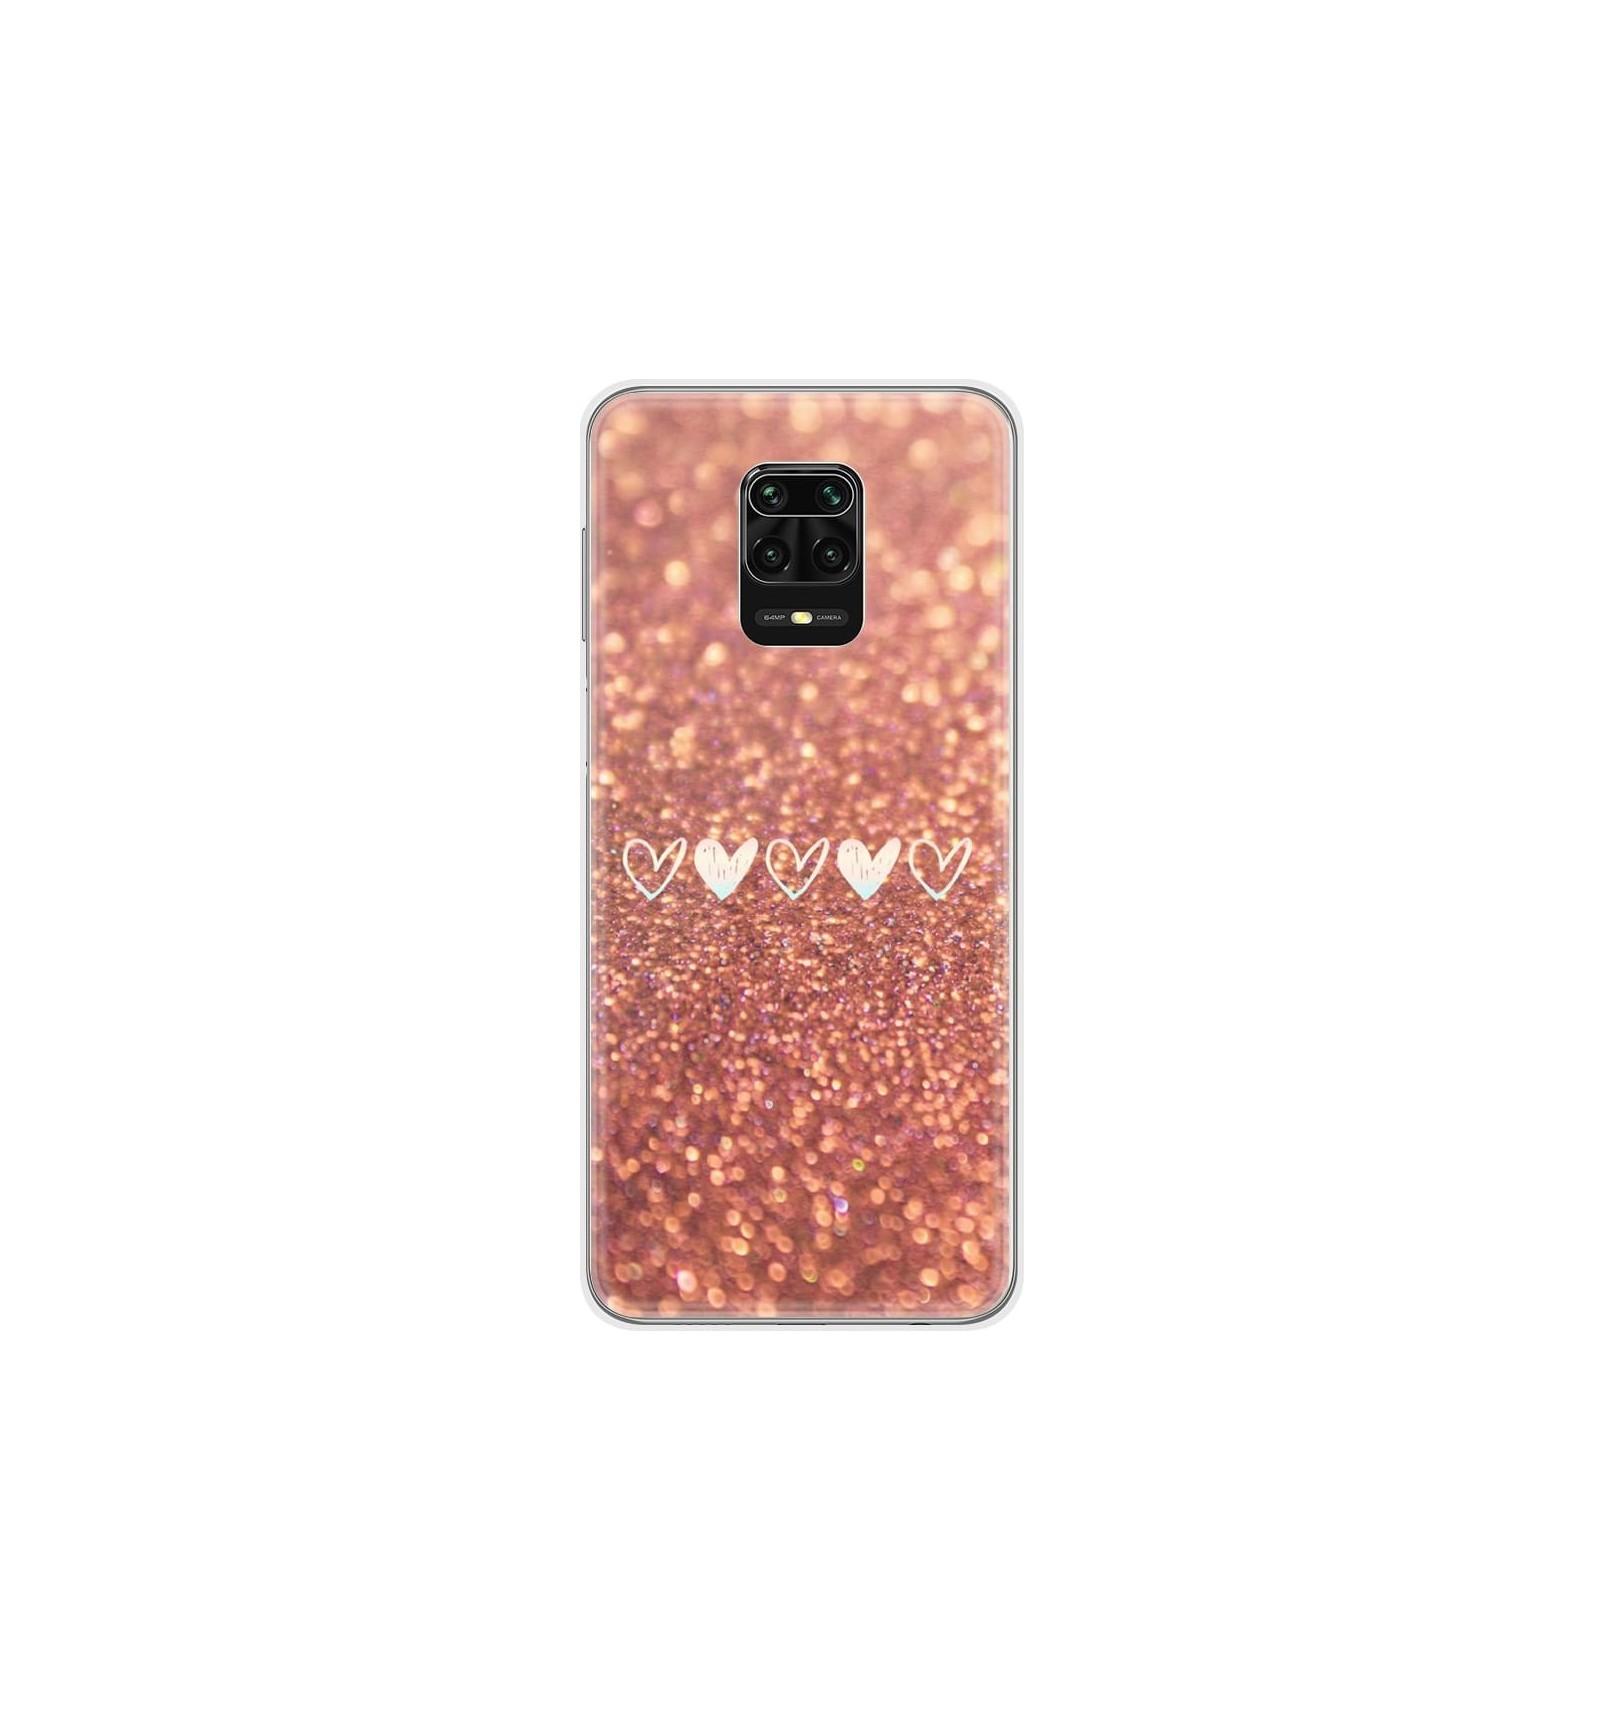 Coque En Silicone Xiaomi Redmi Note 9 Pro Paillettes Coeur